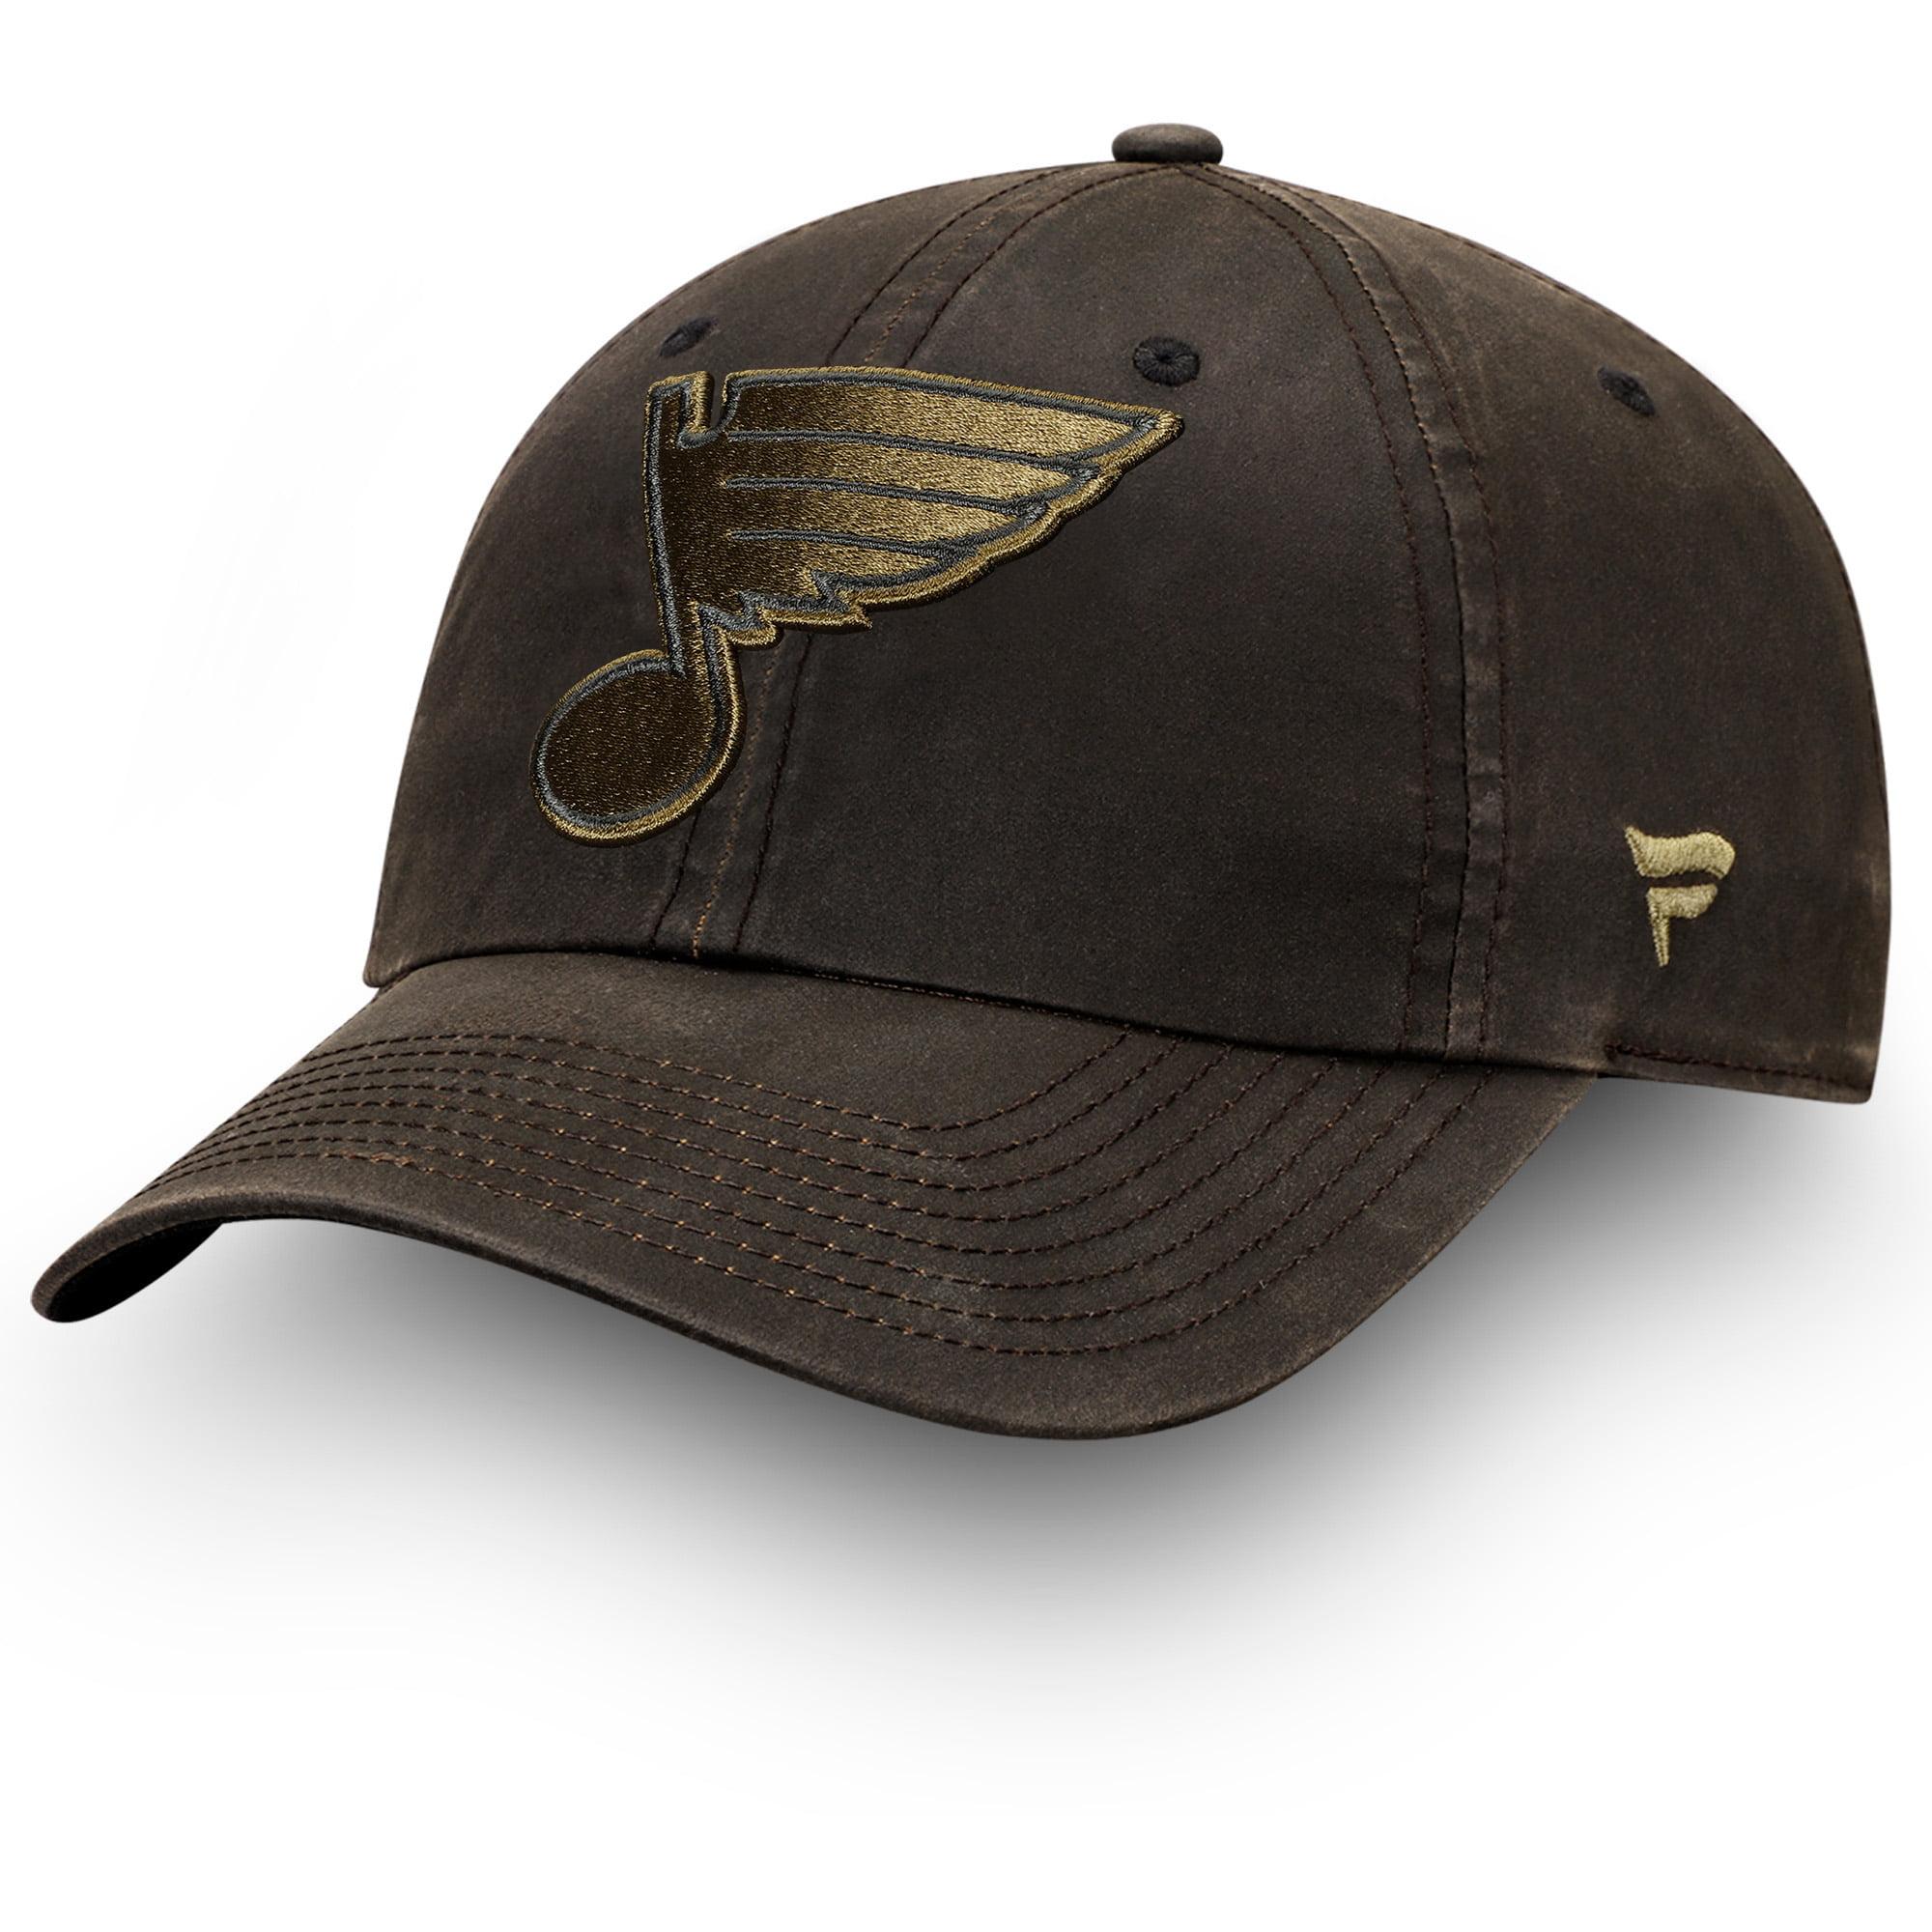 St. Louis Blues Fanatics Branded Lux Fundamental Adjustable Hat - Brown/Olive - OSFA